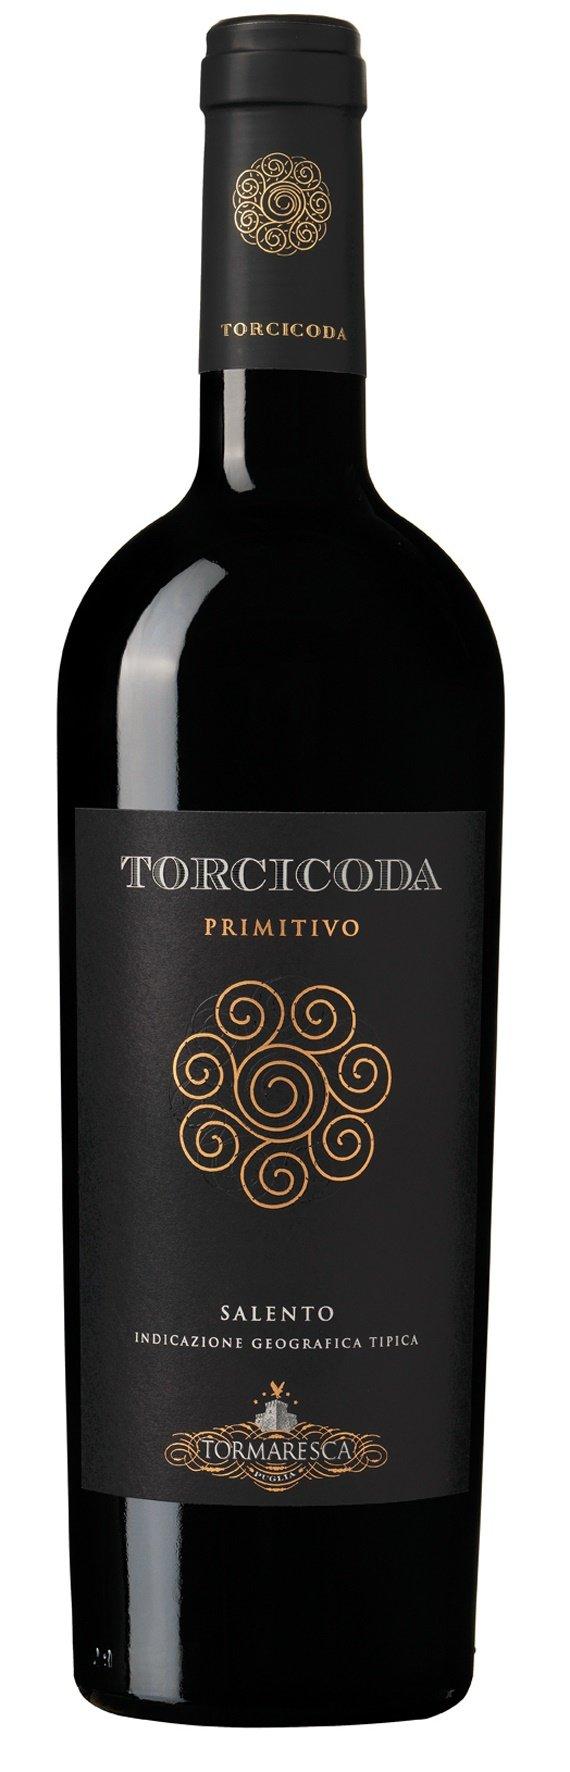 6x-075l-2016er-Tormaresca-Torcicoda-Primitivo-Salento-IGT-Apulien-Italien-Rotwein-trocken